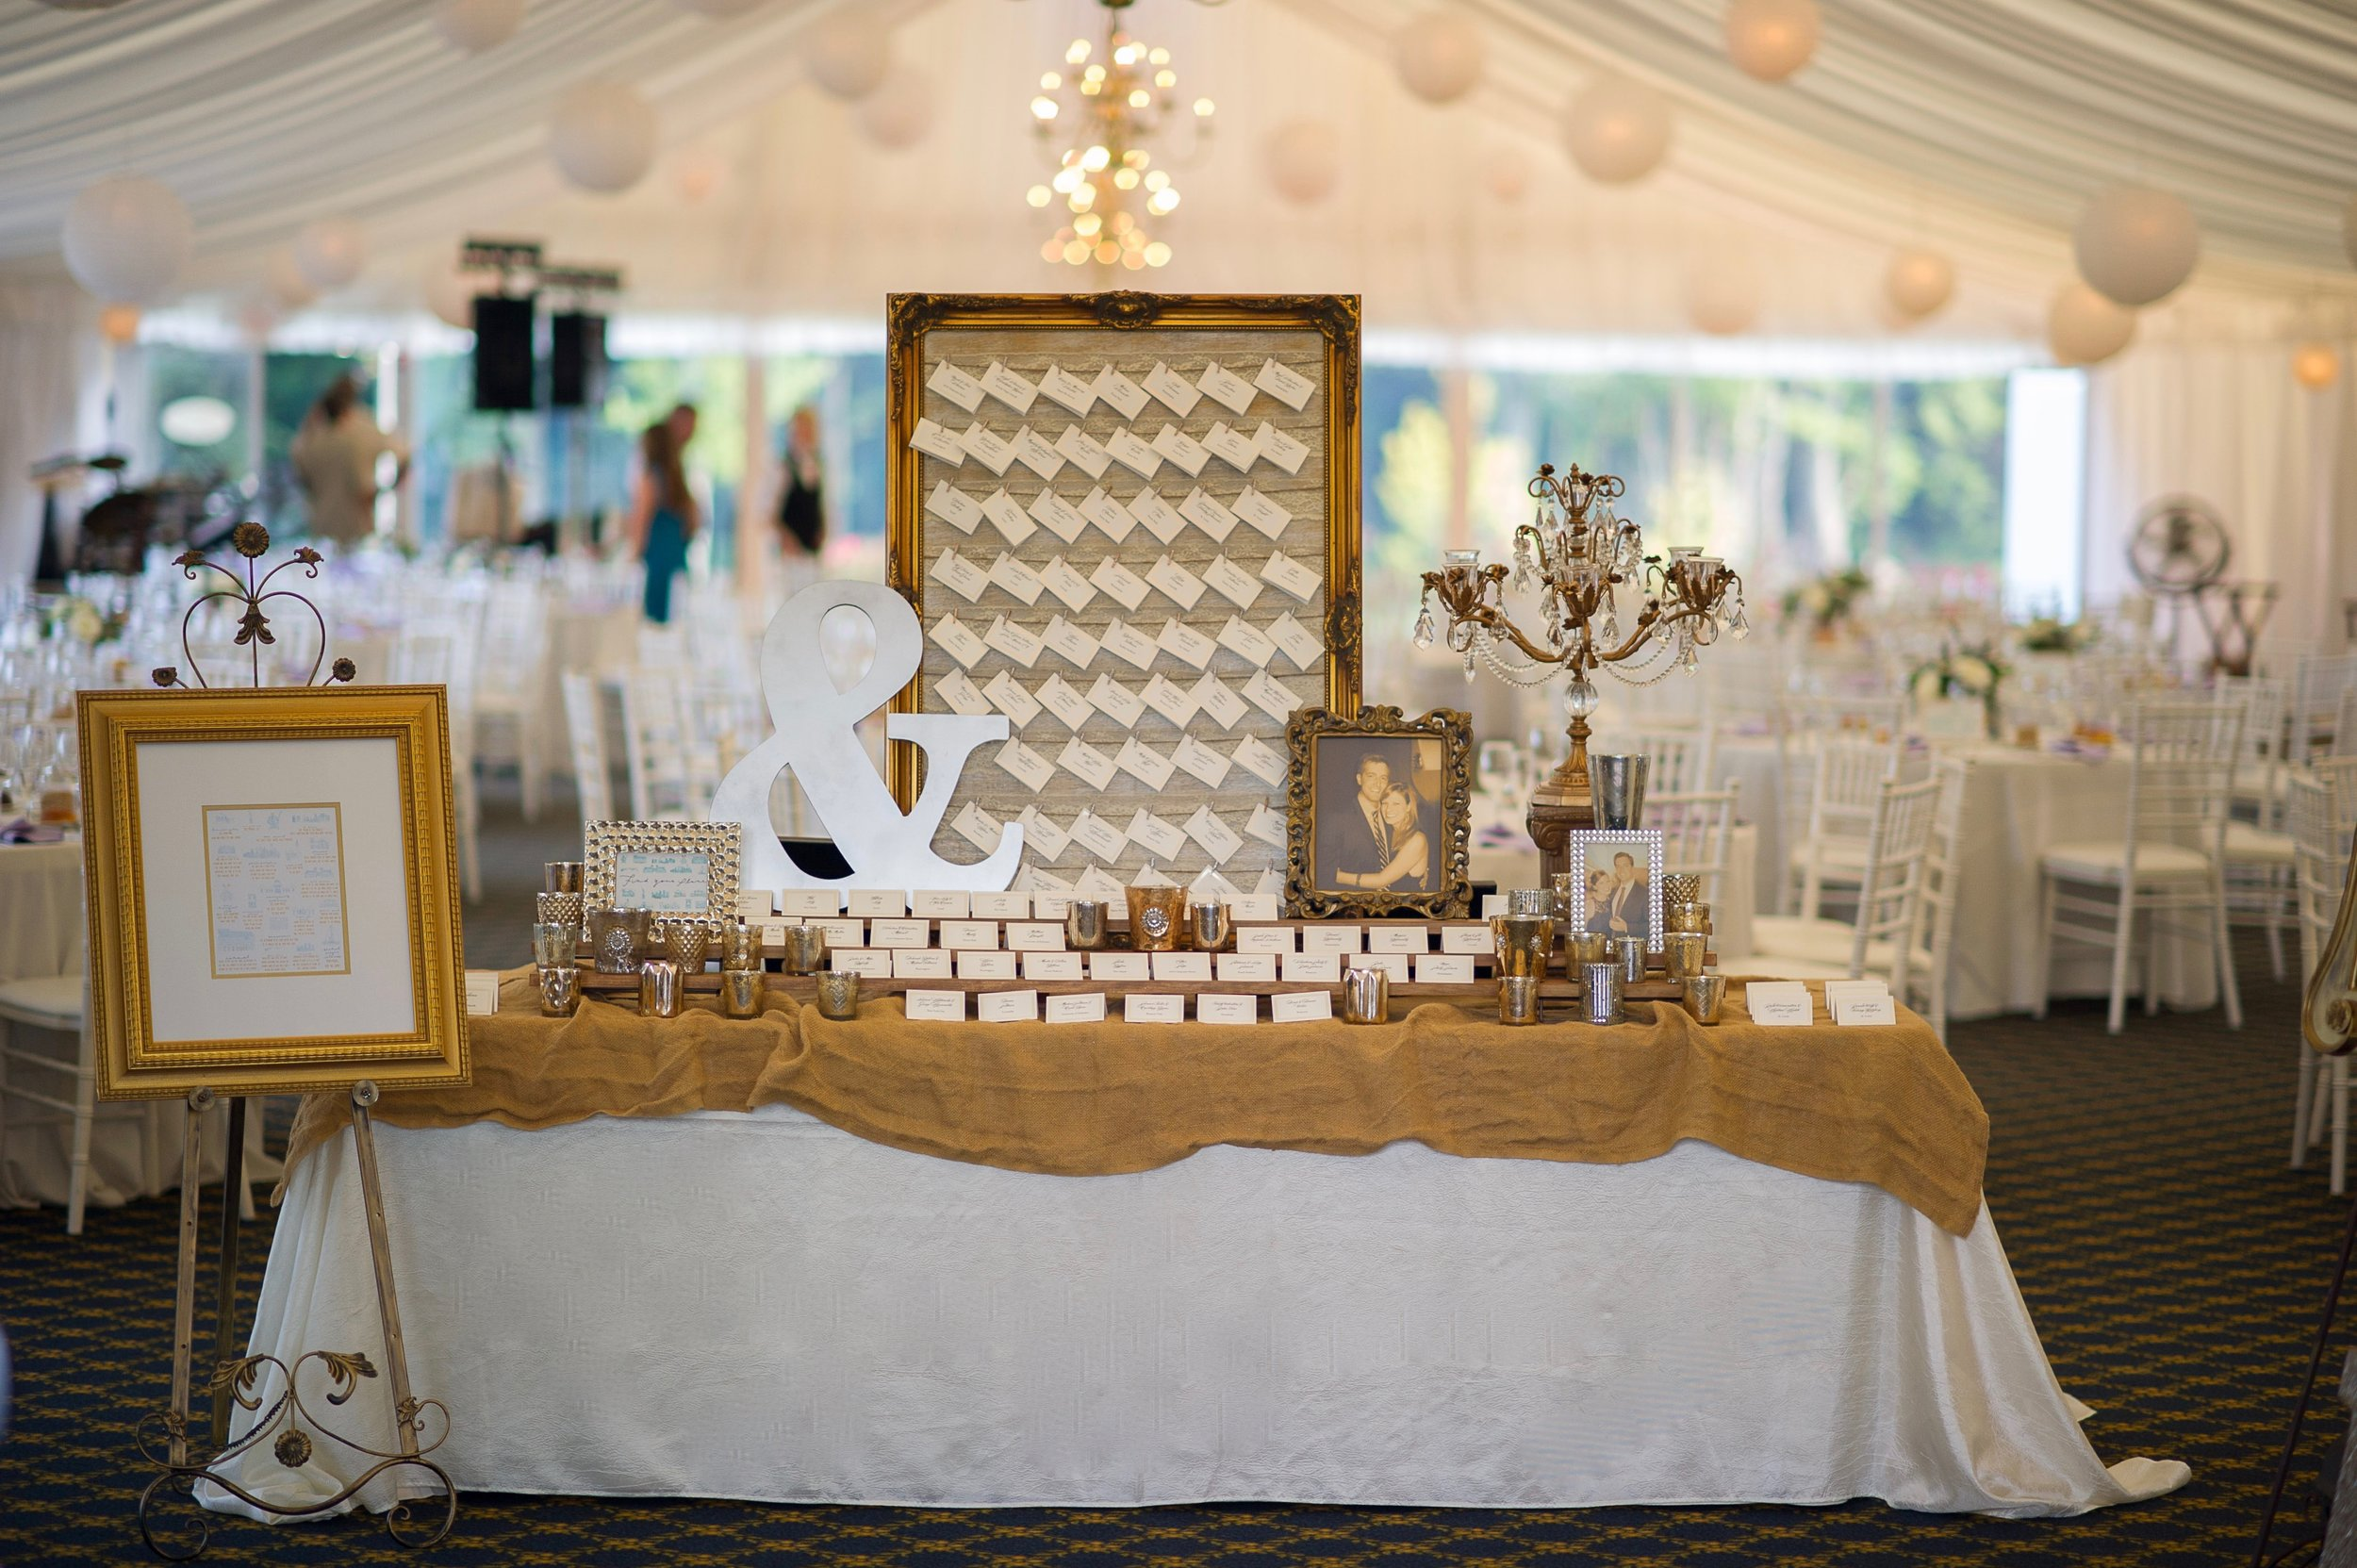 brandywine-wedding-tessie-reveliotis-photography-beautiful-and-blessed-events-002